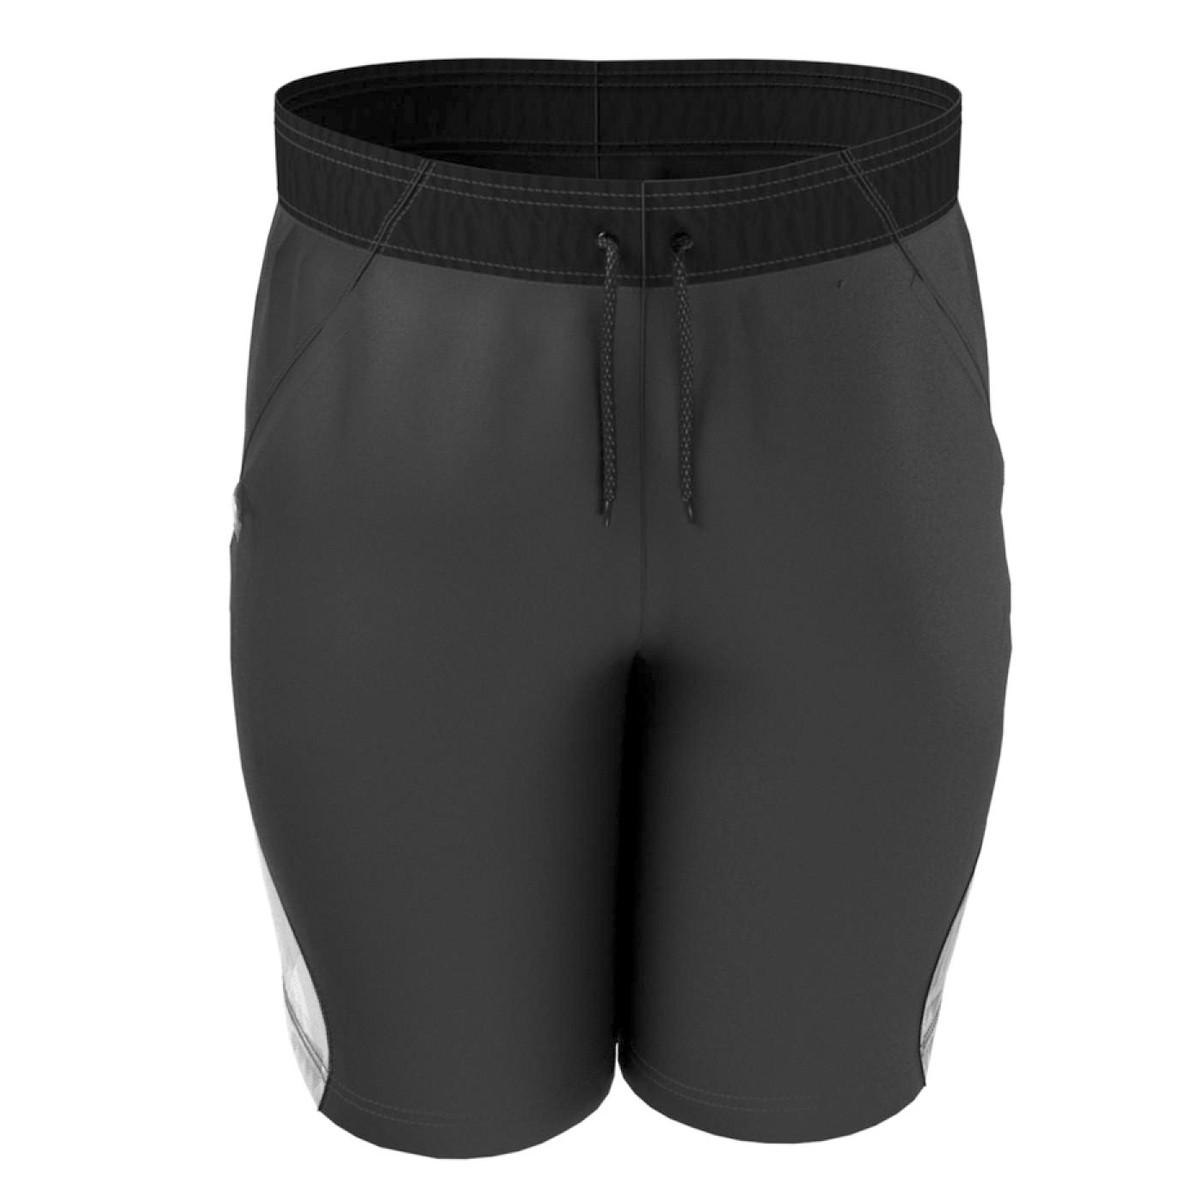 Pantalón corto Under Armour Embiid 'Black'